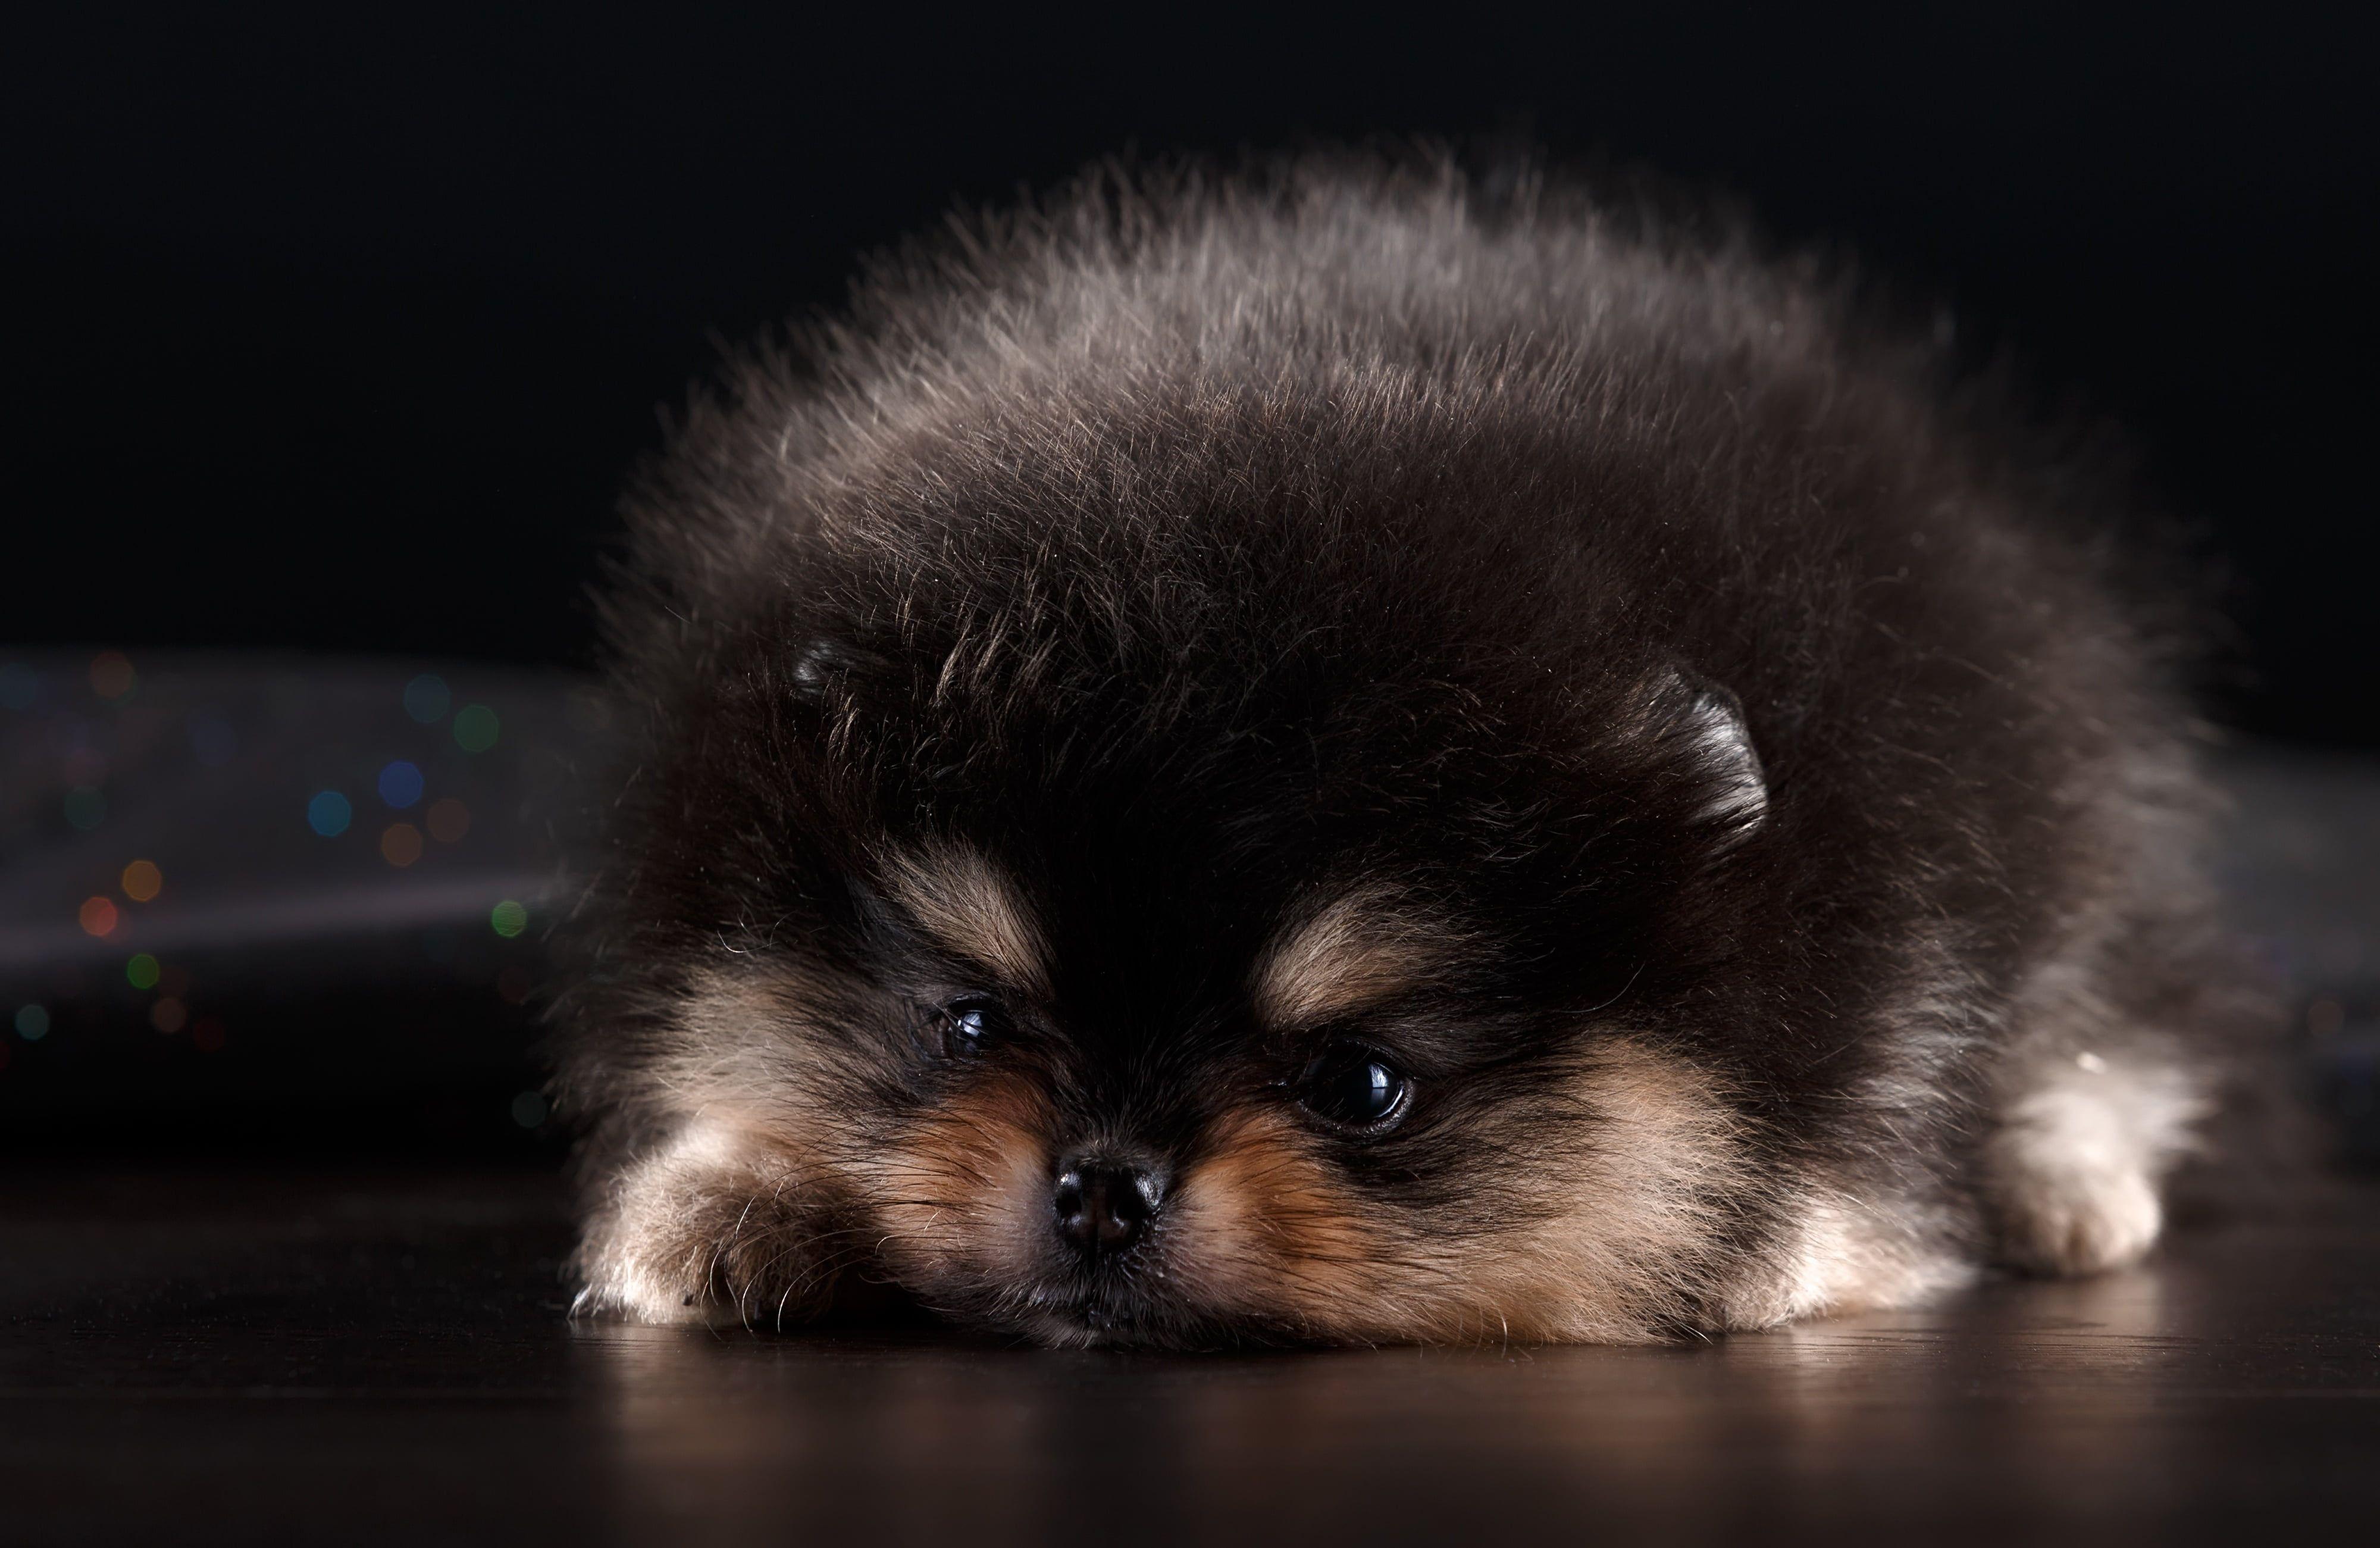 Black And Tan Teacup Pomeranian Sits Teacup Pomeranian Cute Animals Puppies Pomeranian Puppy Hd wallpaper pomeranian dog animal pet